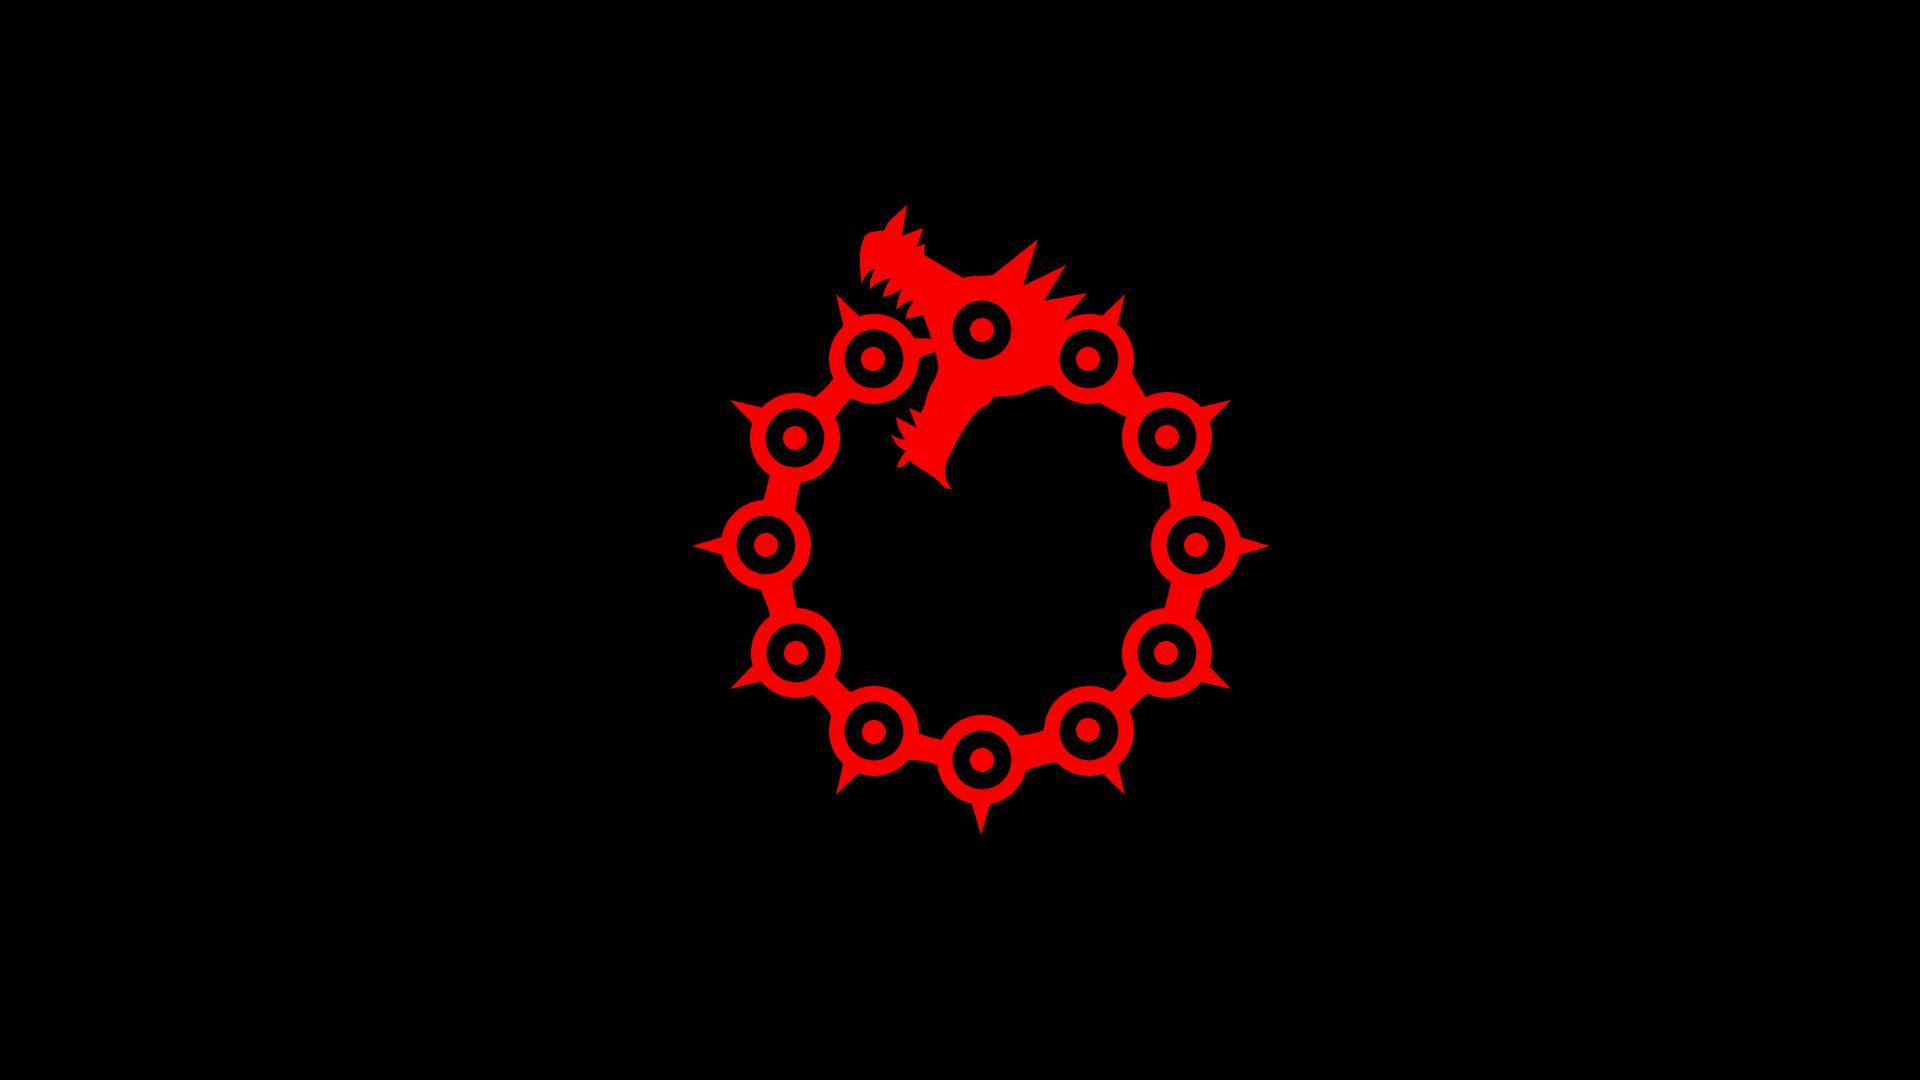 Nanatsu No Taizai The Seven Deadly Sins Wallpaper Hd Luffy One